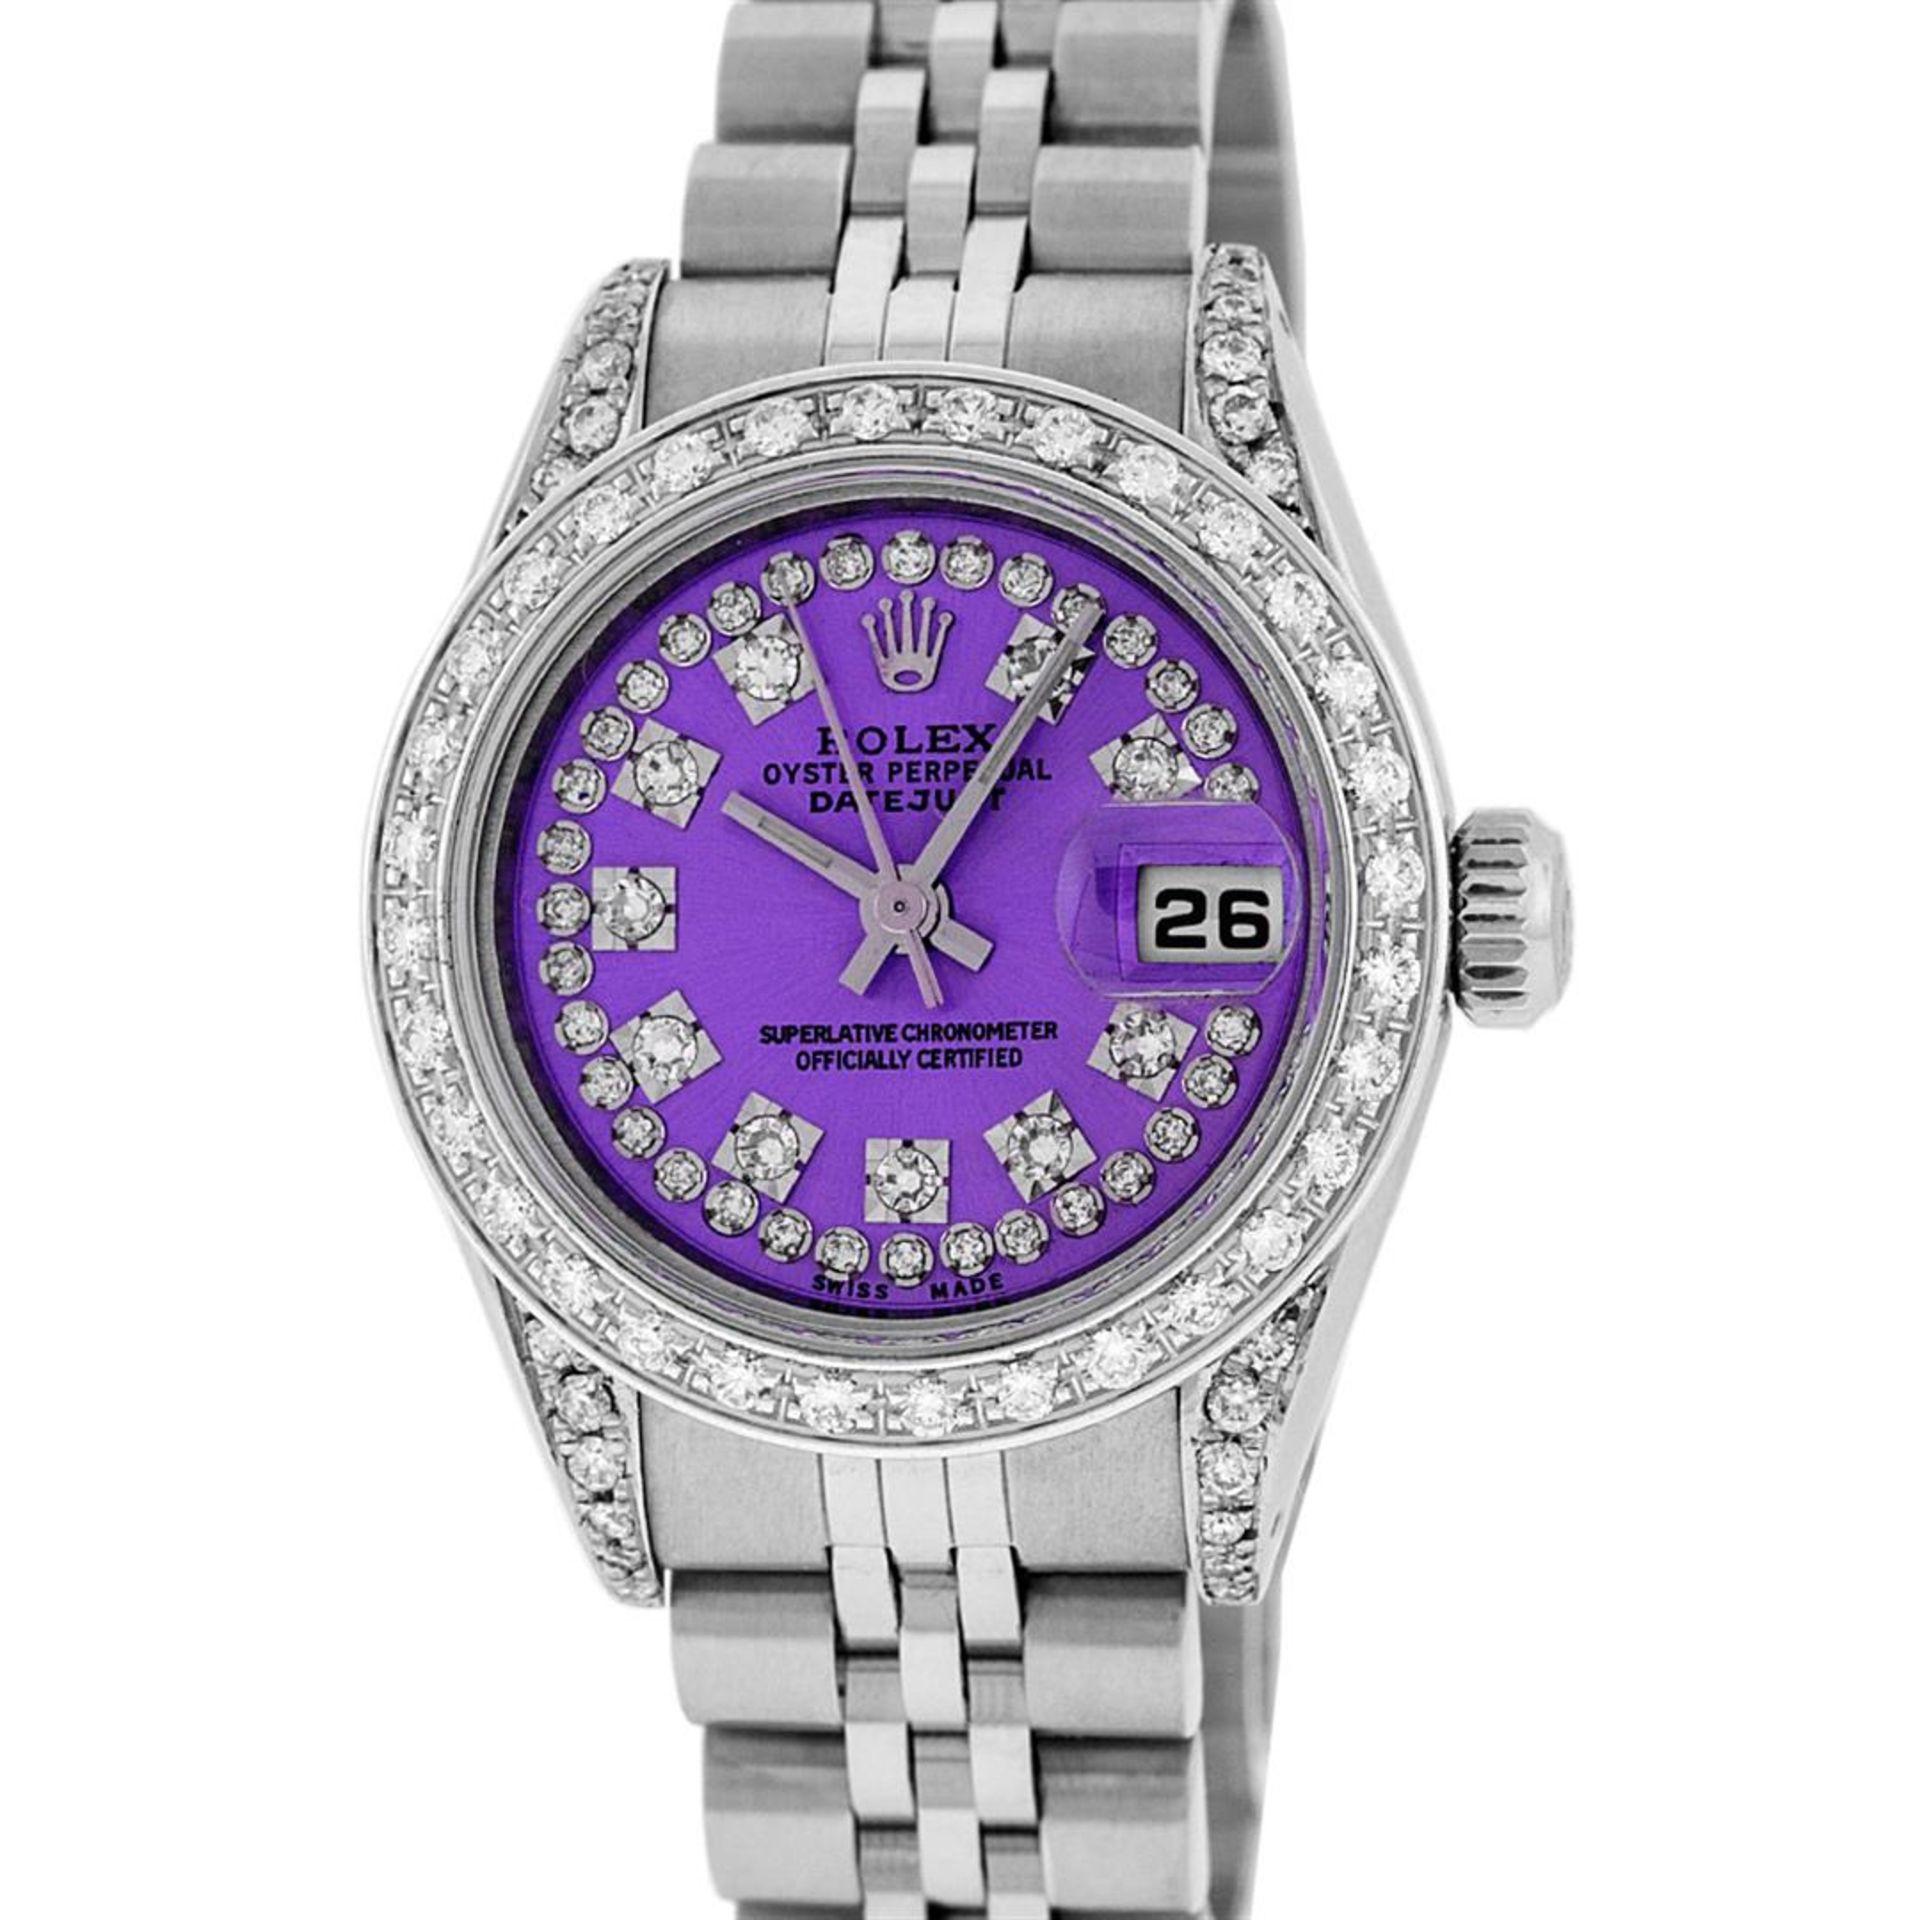 Rolex Ladies Stainless Steel 26MM Purple String Diamond Lugs Datejust Wristwatch - Image 2 of 9